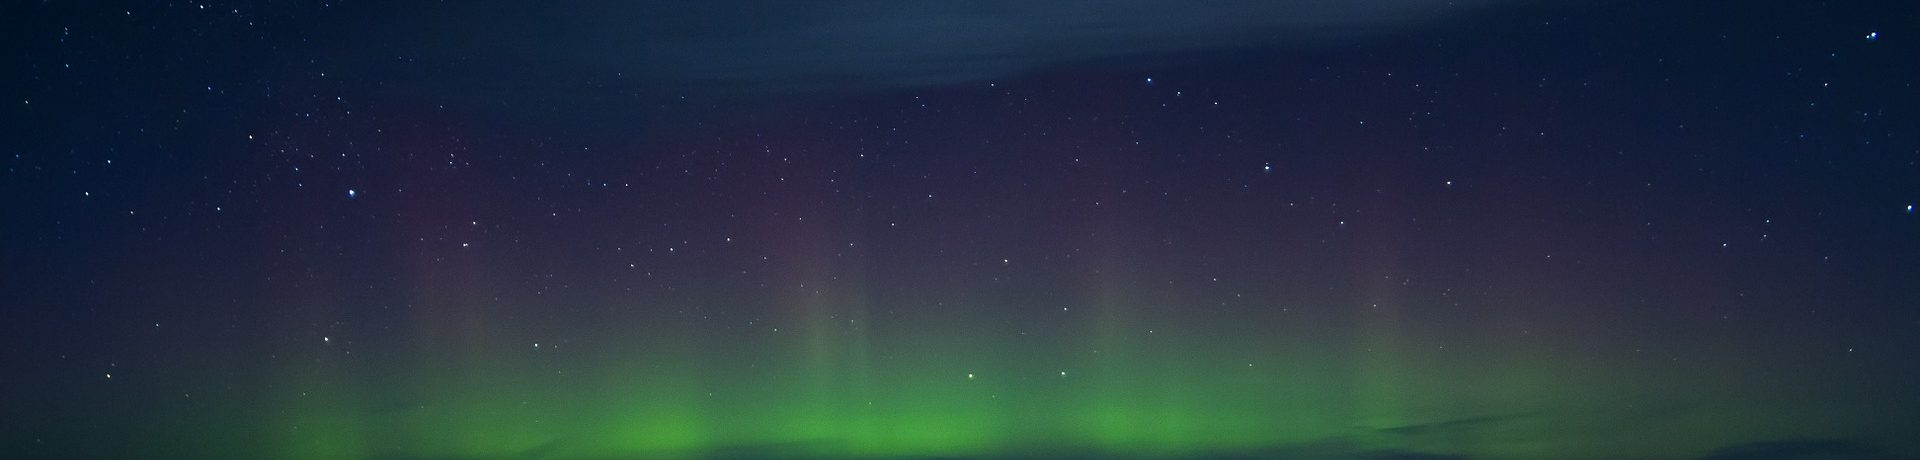 northern-lights-1081752_1920-e1528205087671